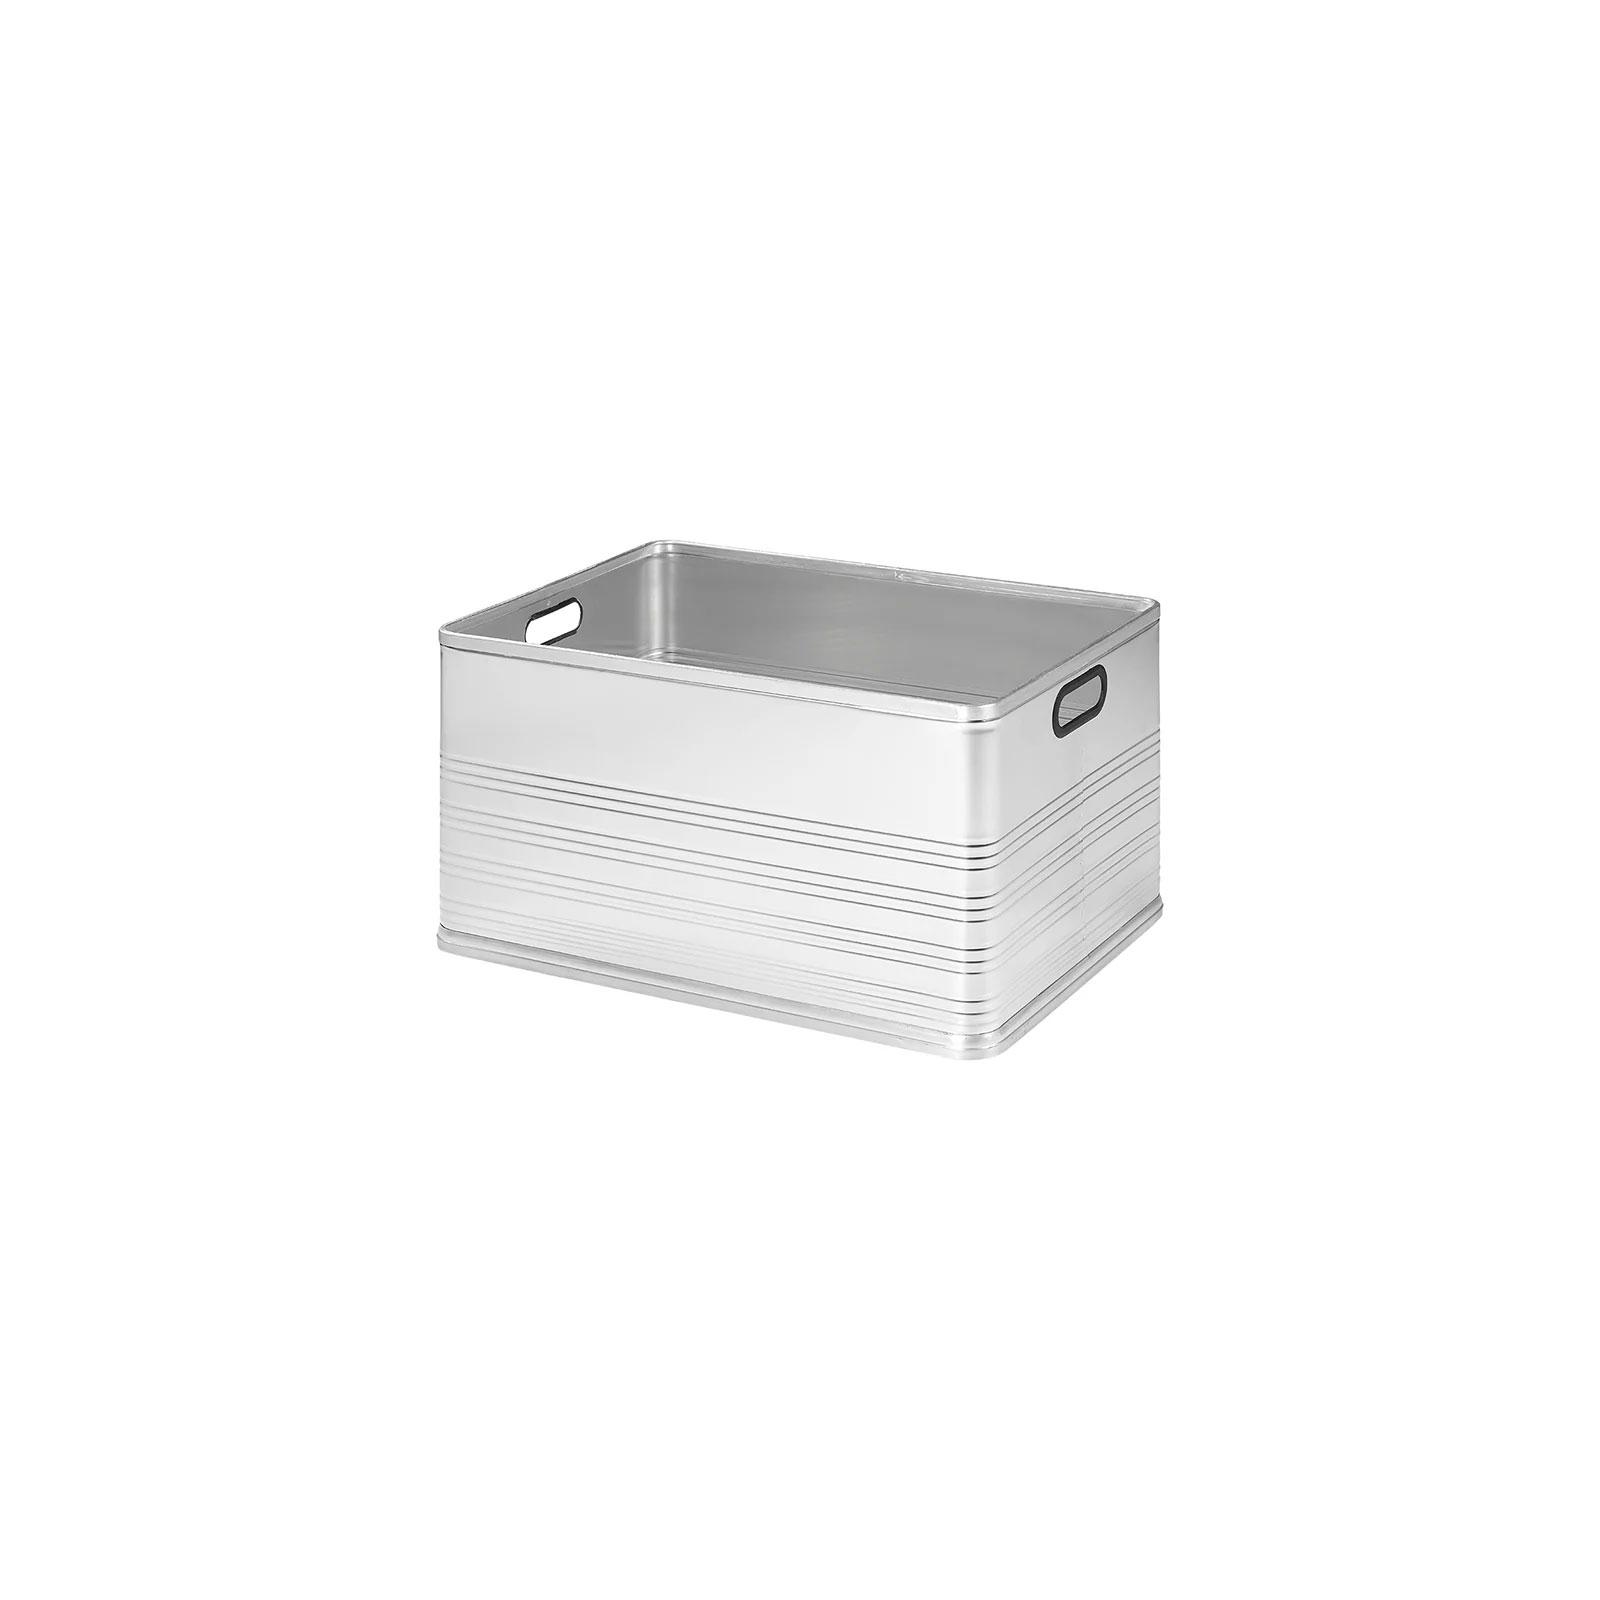 Aluminiumbox Transportbox Alukiste Staubox 80L